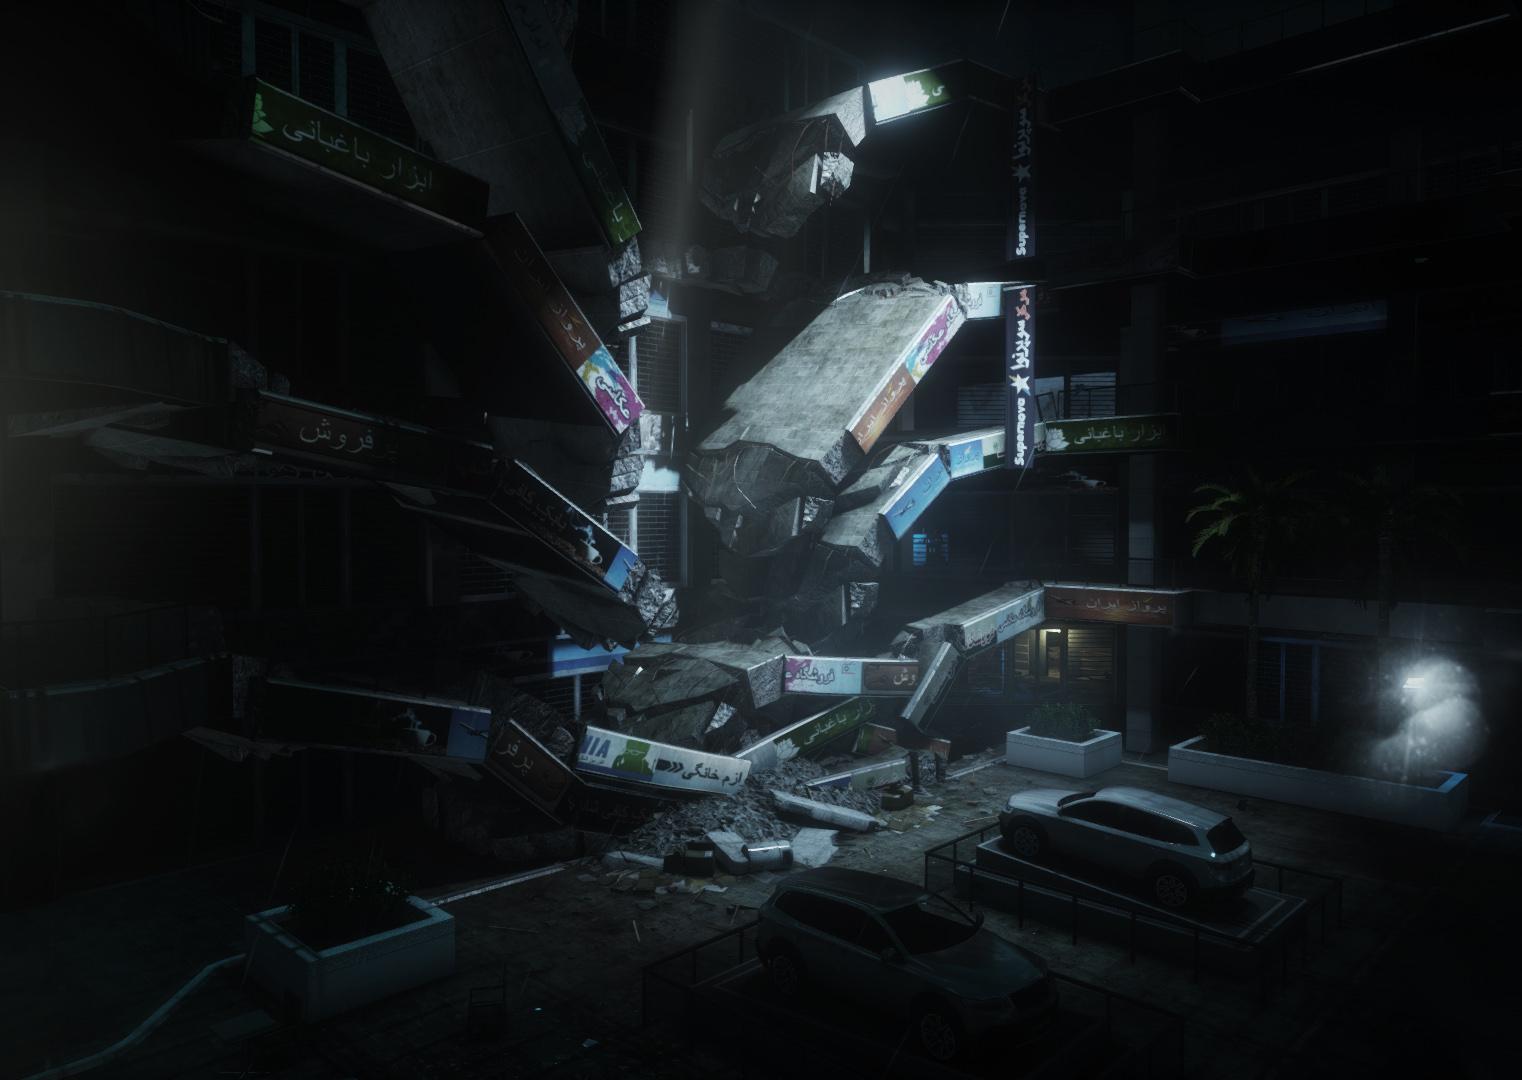 Battlefield 3|Screenshot 1 by Pino44io on DeviantArt